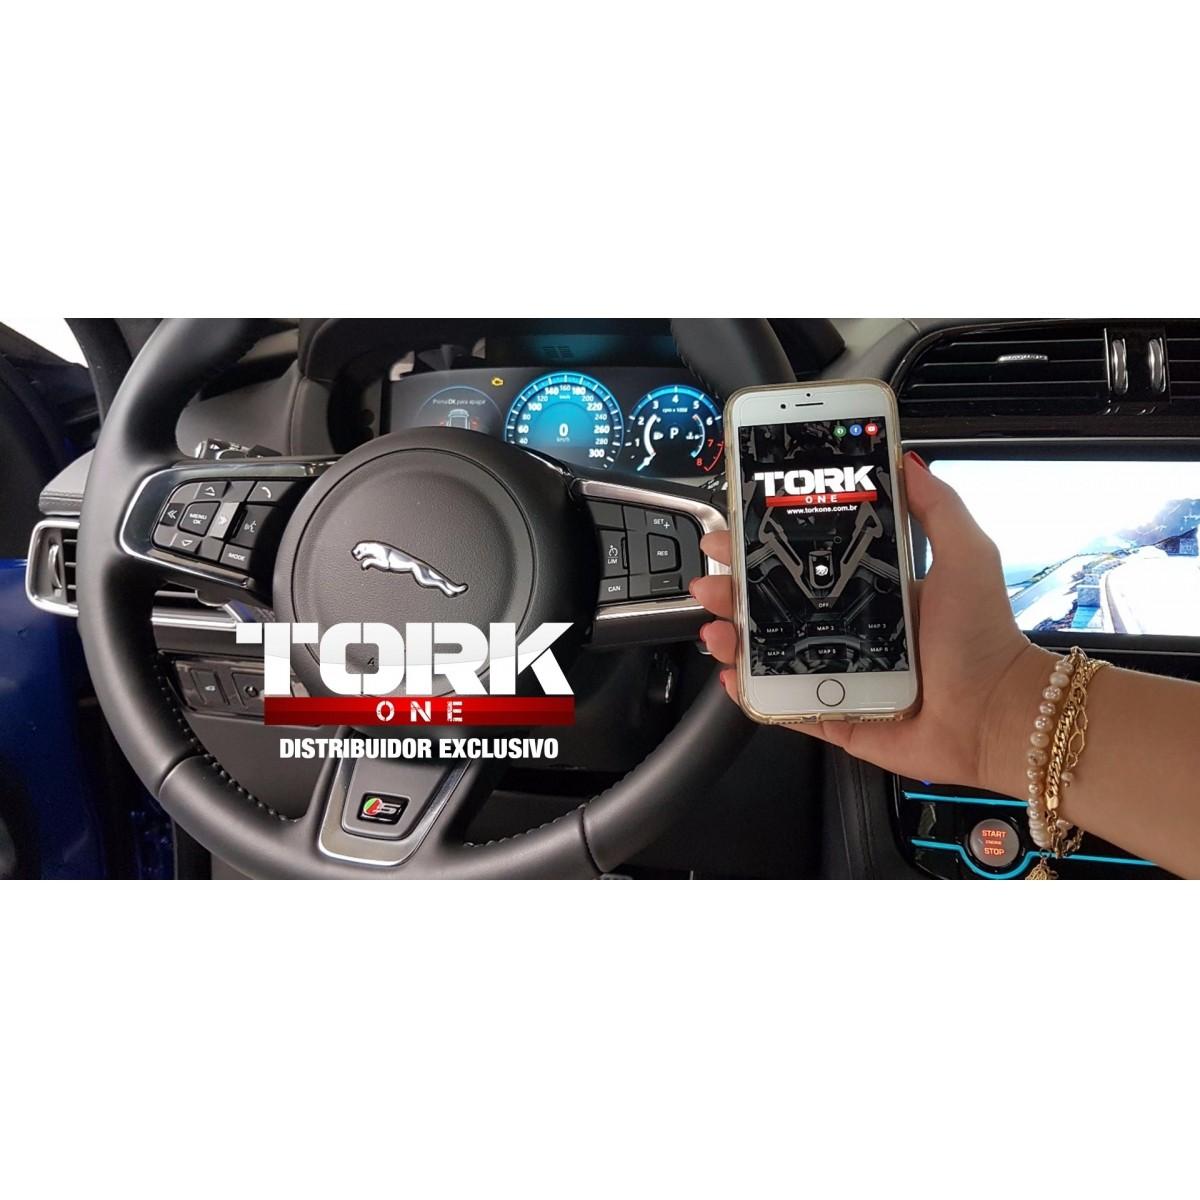 Piggyback Toyota Tork One